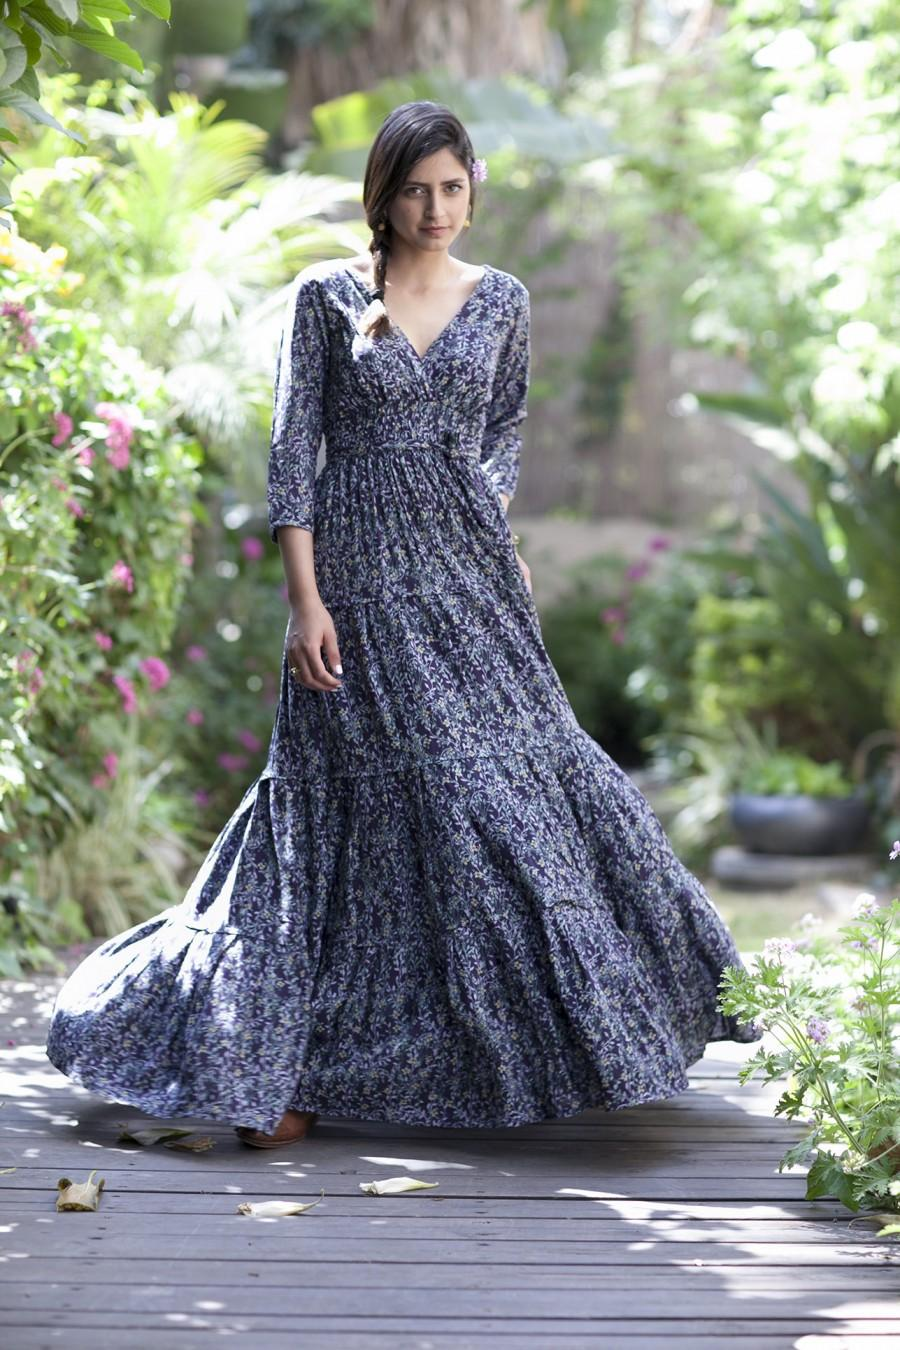 Mariage - Long Sleeves Maxi Dress, Hippie Conservative Evening Fall Dress, Winter Floral Dress, Boho dress, Gypsy Romantic Carrie Dress, Frill Dress